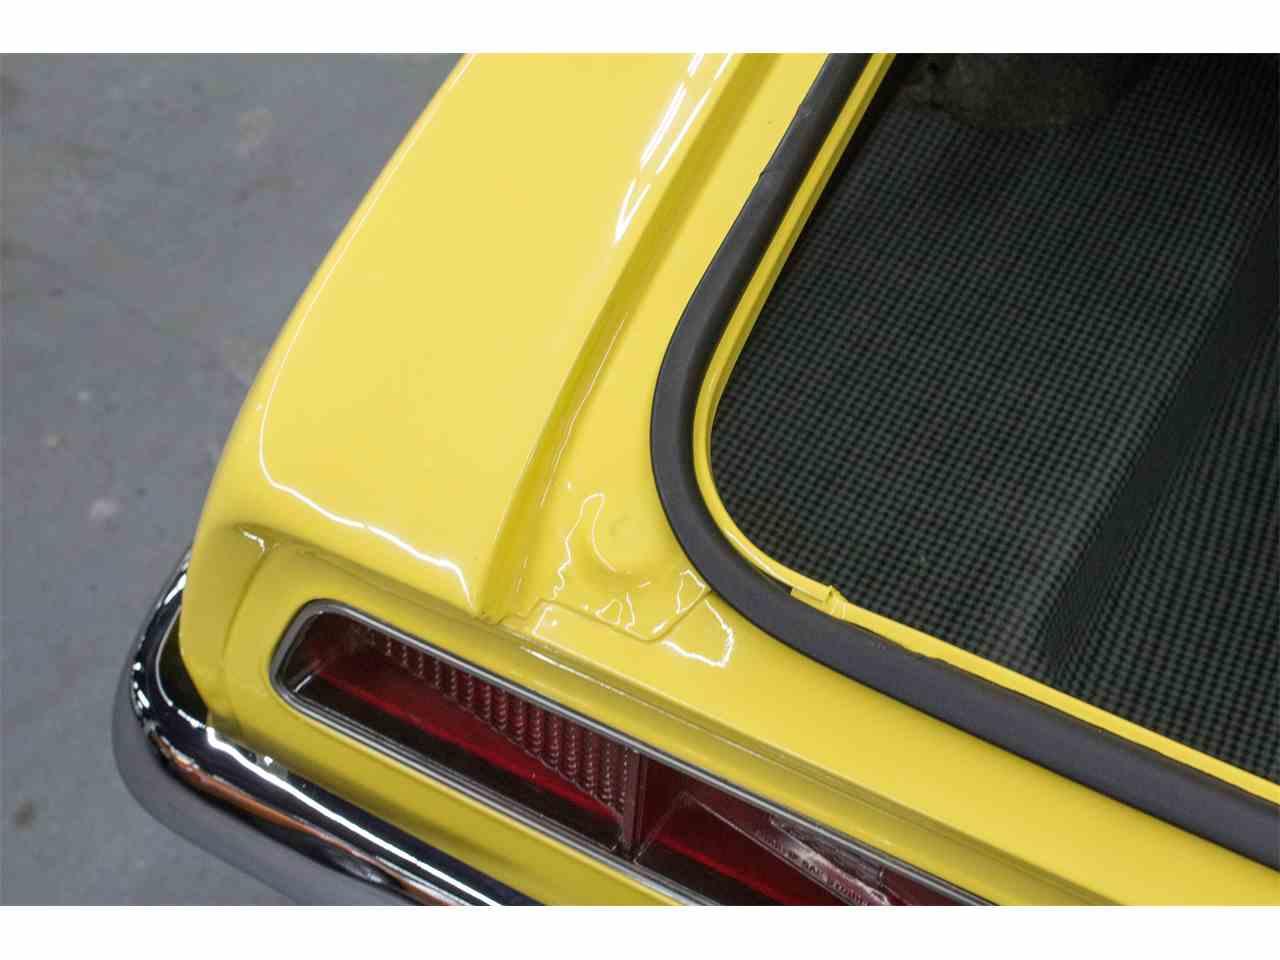 Large Picture of 1969 Chevrolet Camaro Z28 located in Quebec - $79,000.00 - M8KS